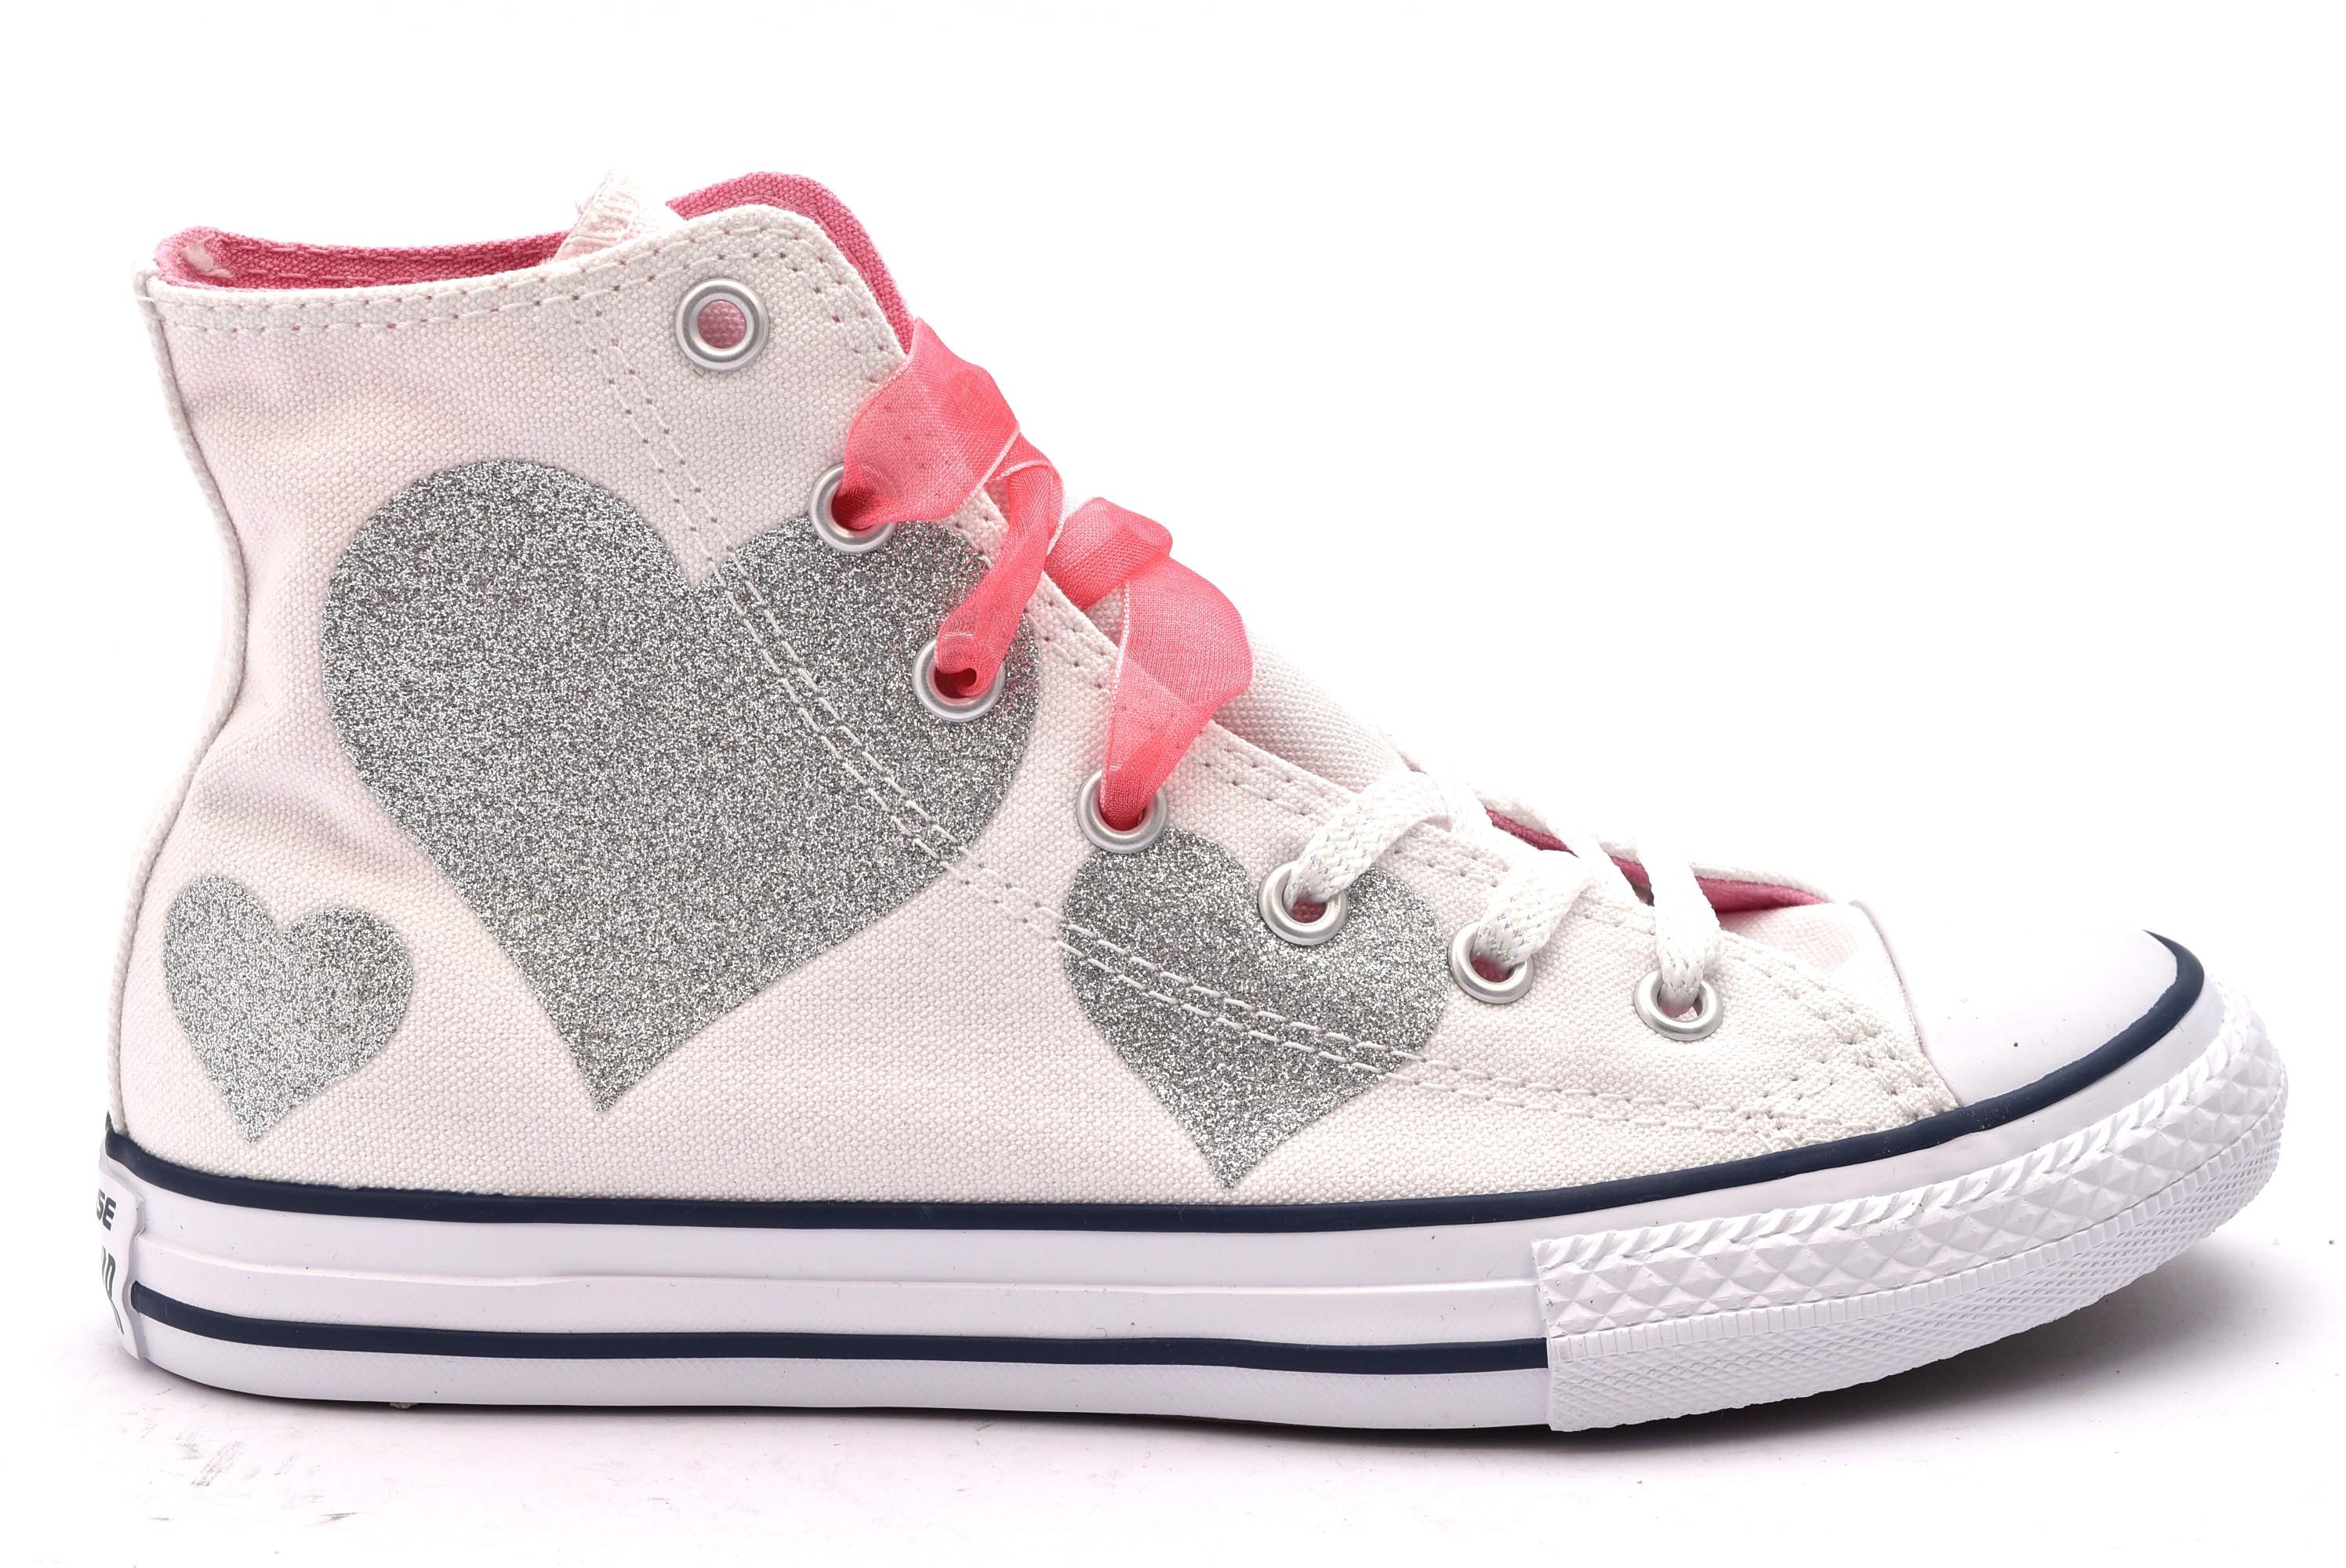 d24558fac4dc6 660971c Converse Shoesmyfriends Star it All g1r8gqnR